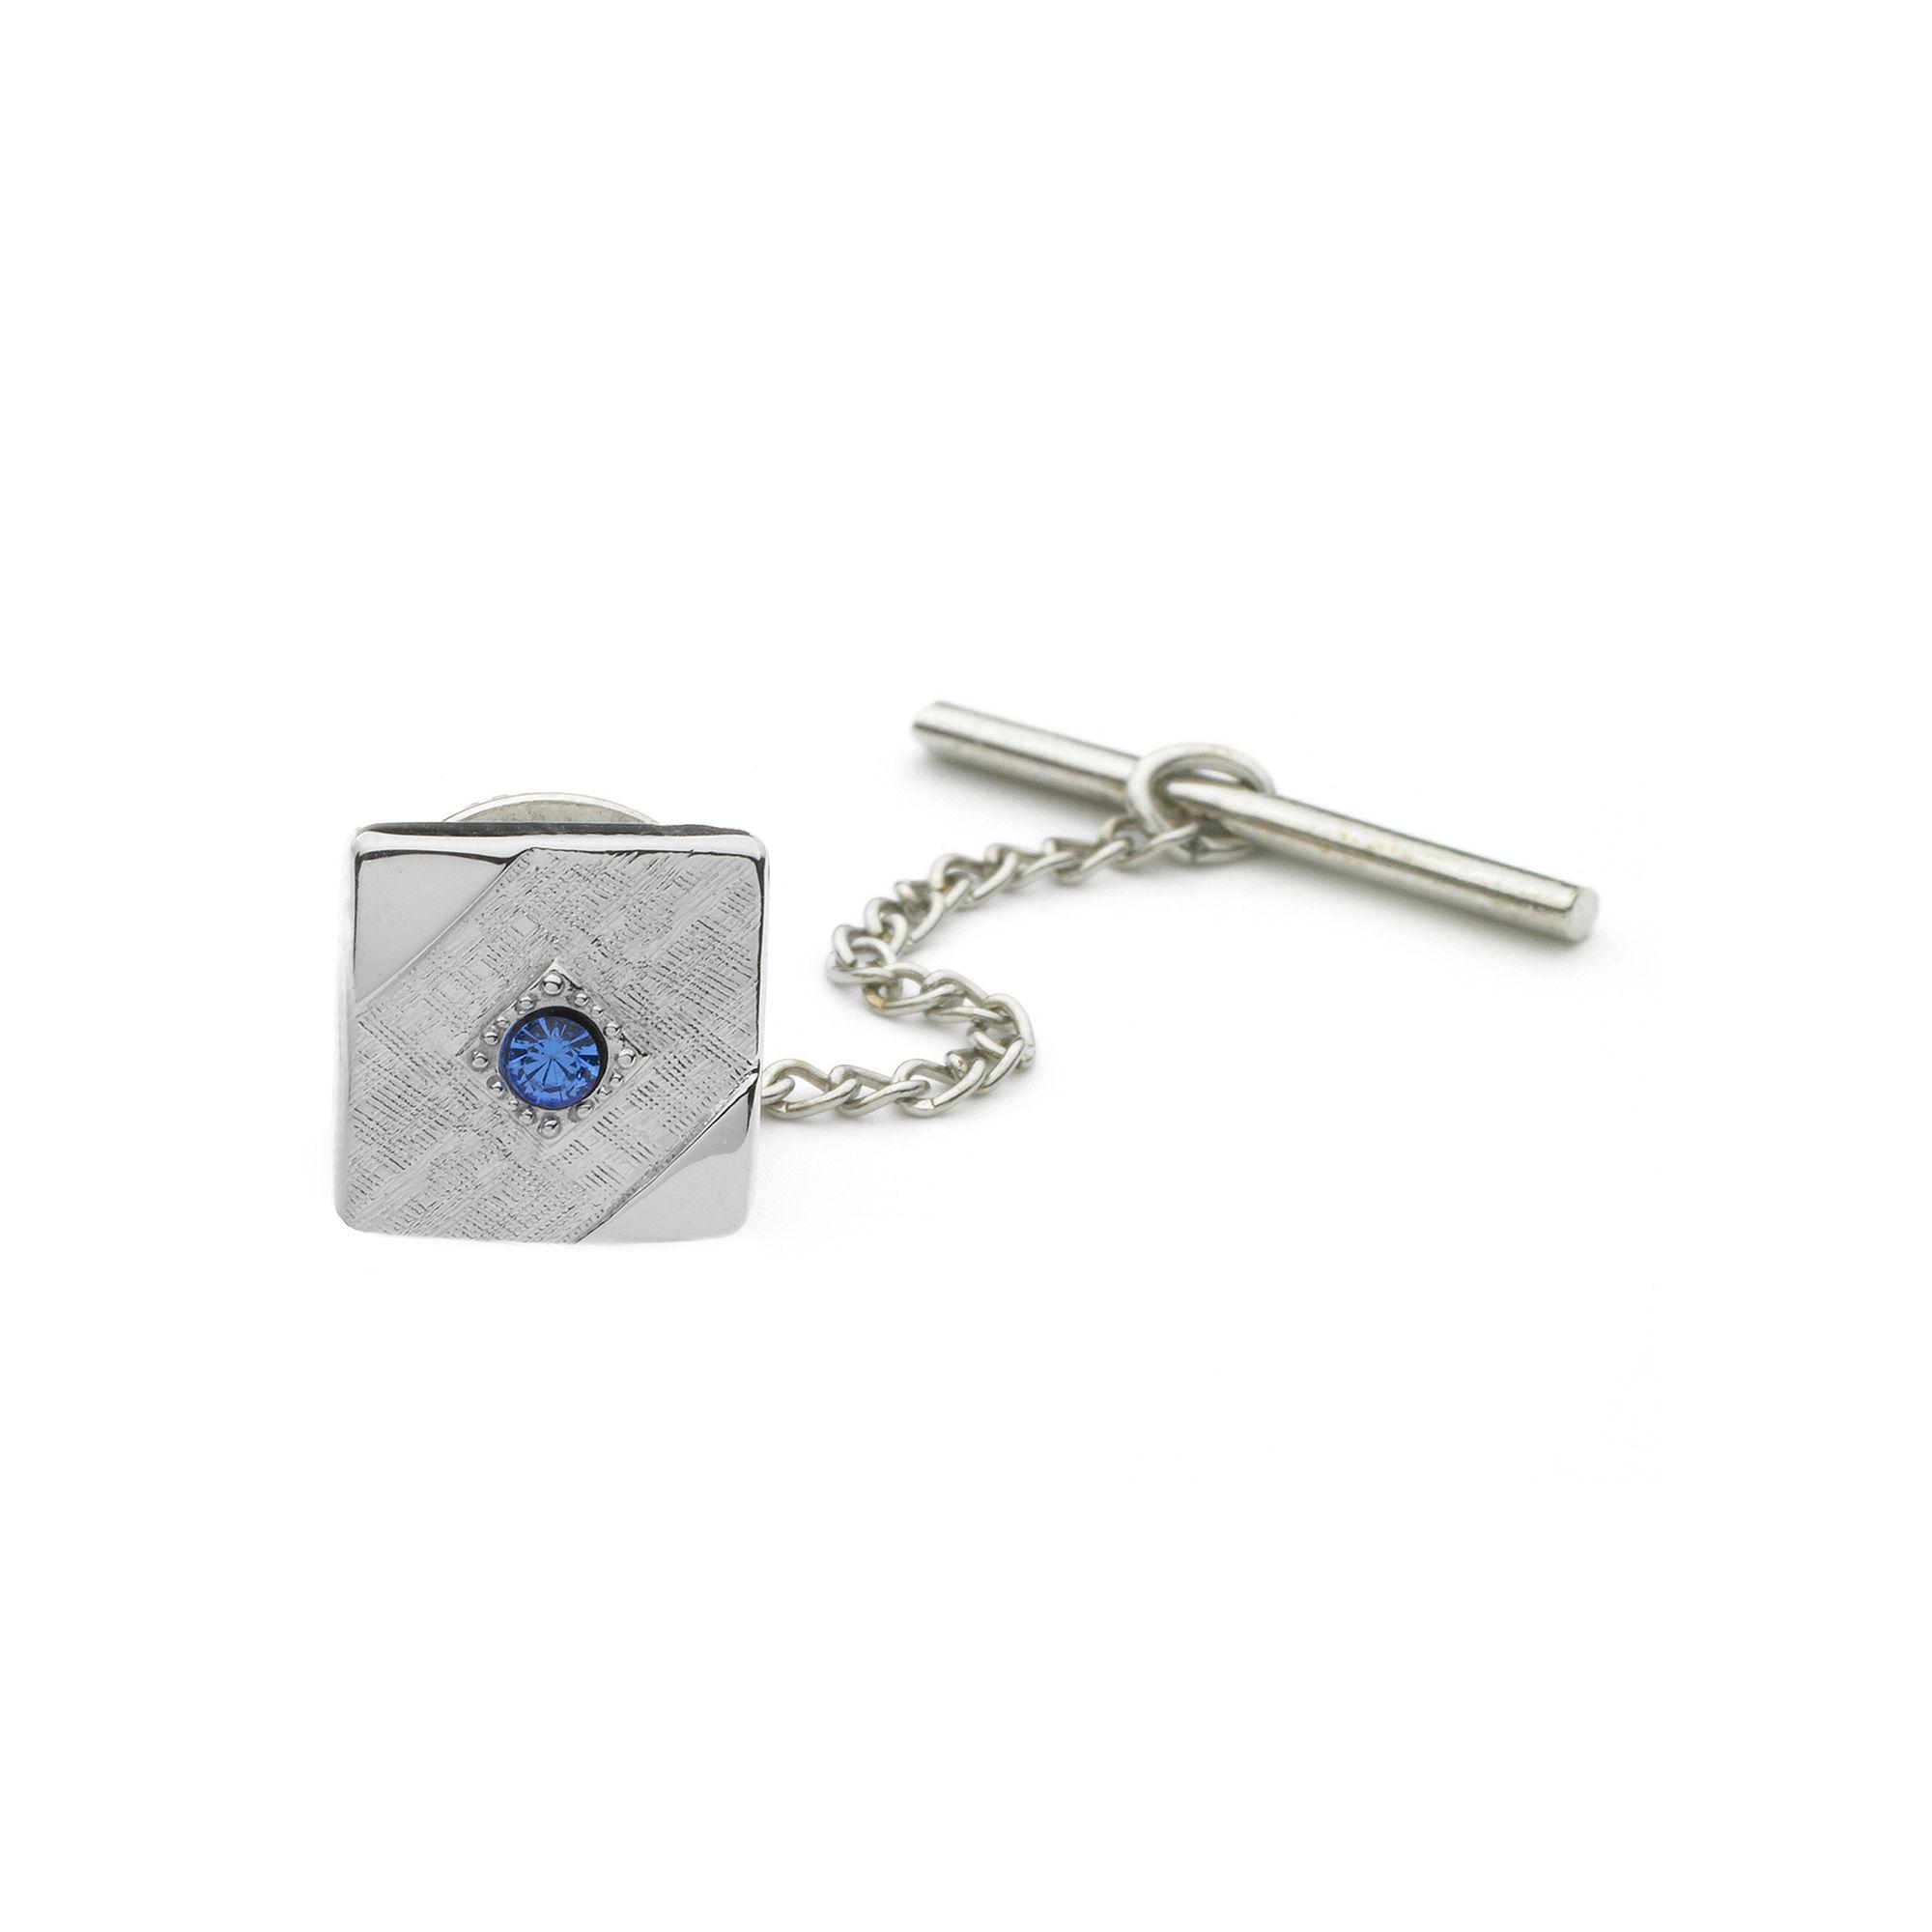 Crystal-Accent Tie Tack